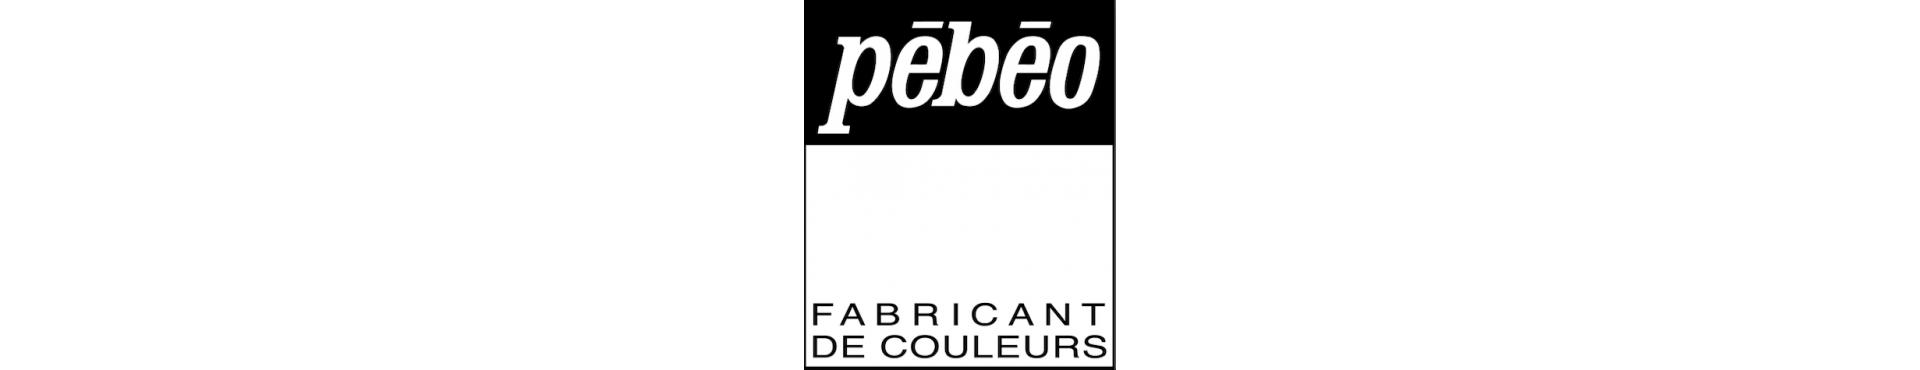 Setacolor-Pebeo